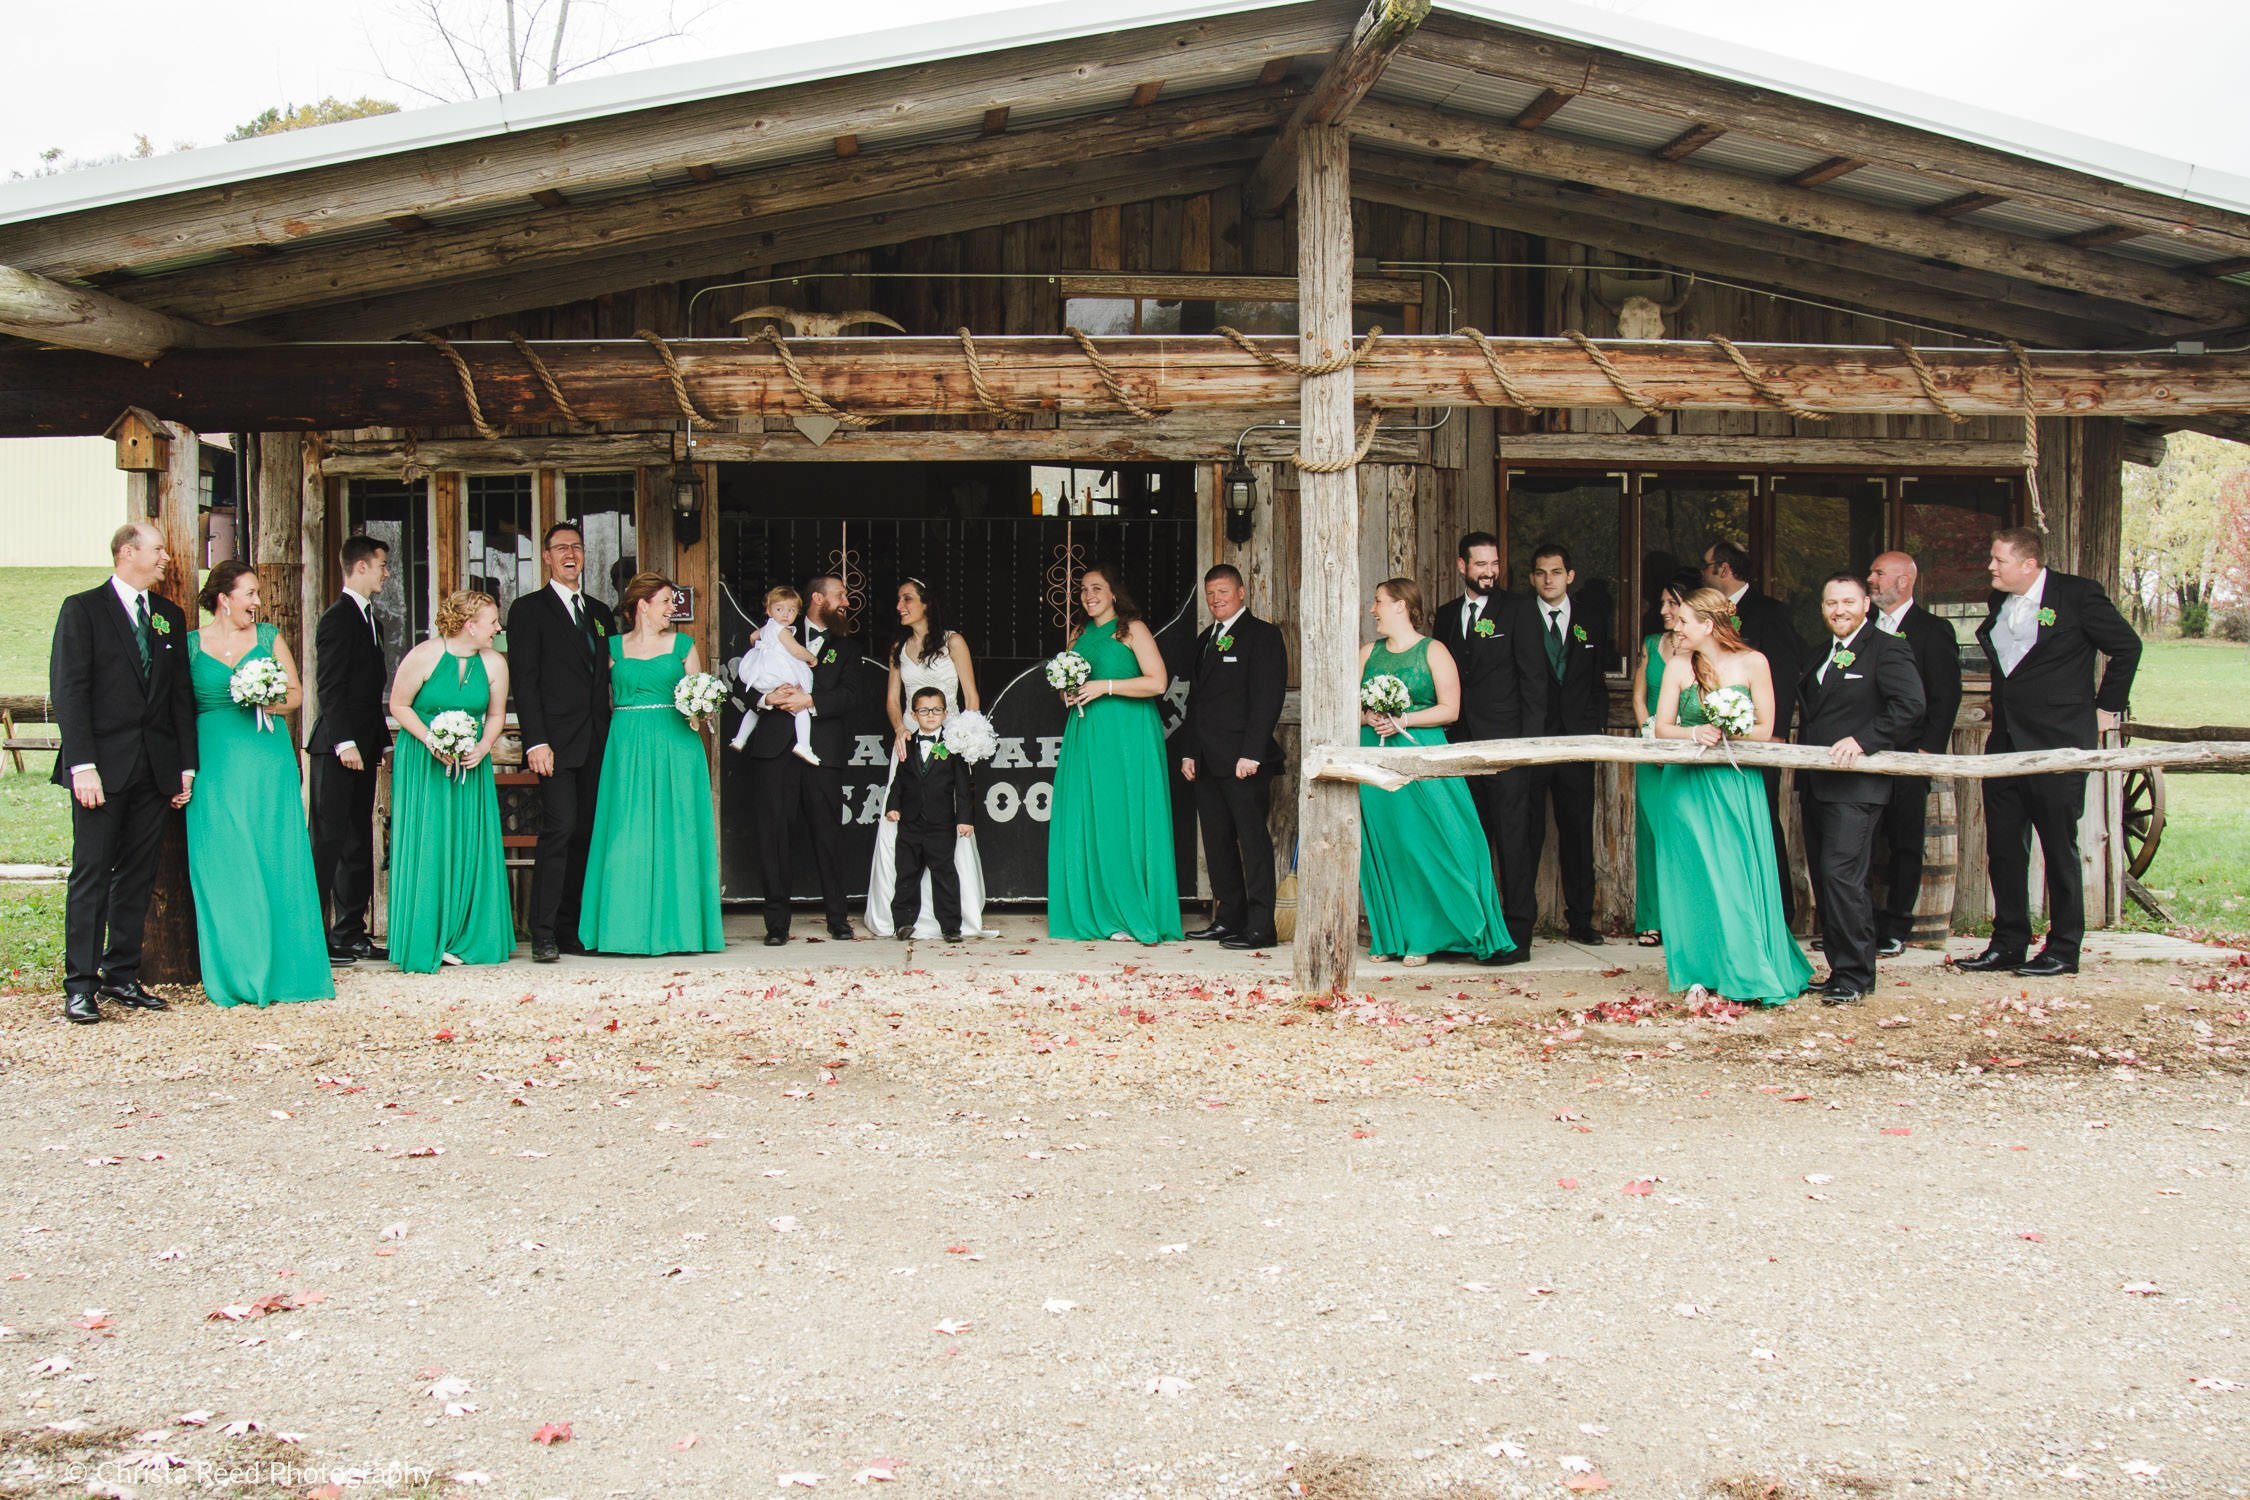 creative group wedding poses | Mankato Wedding Photographer